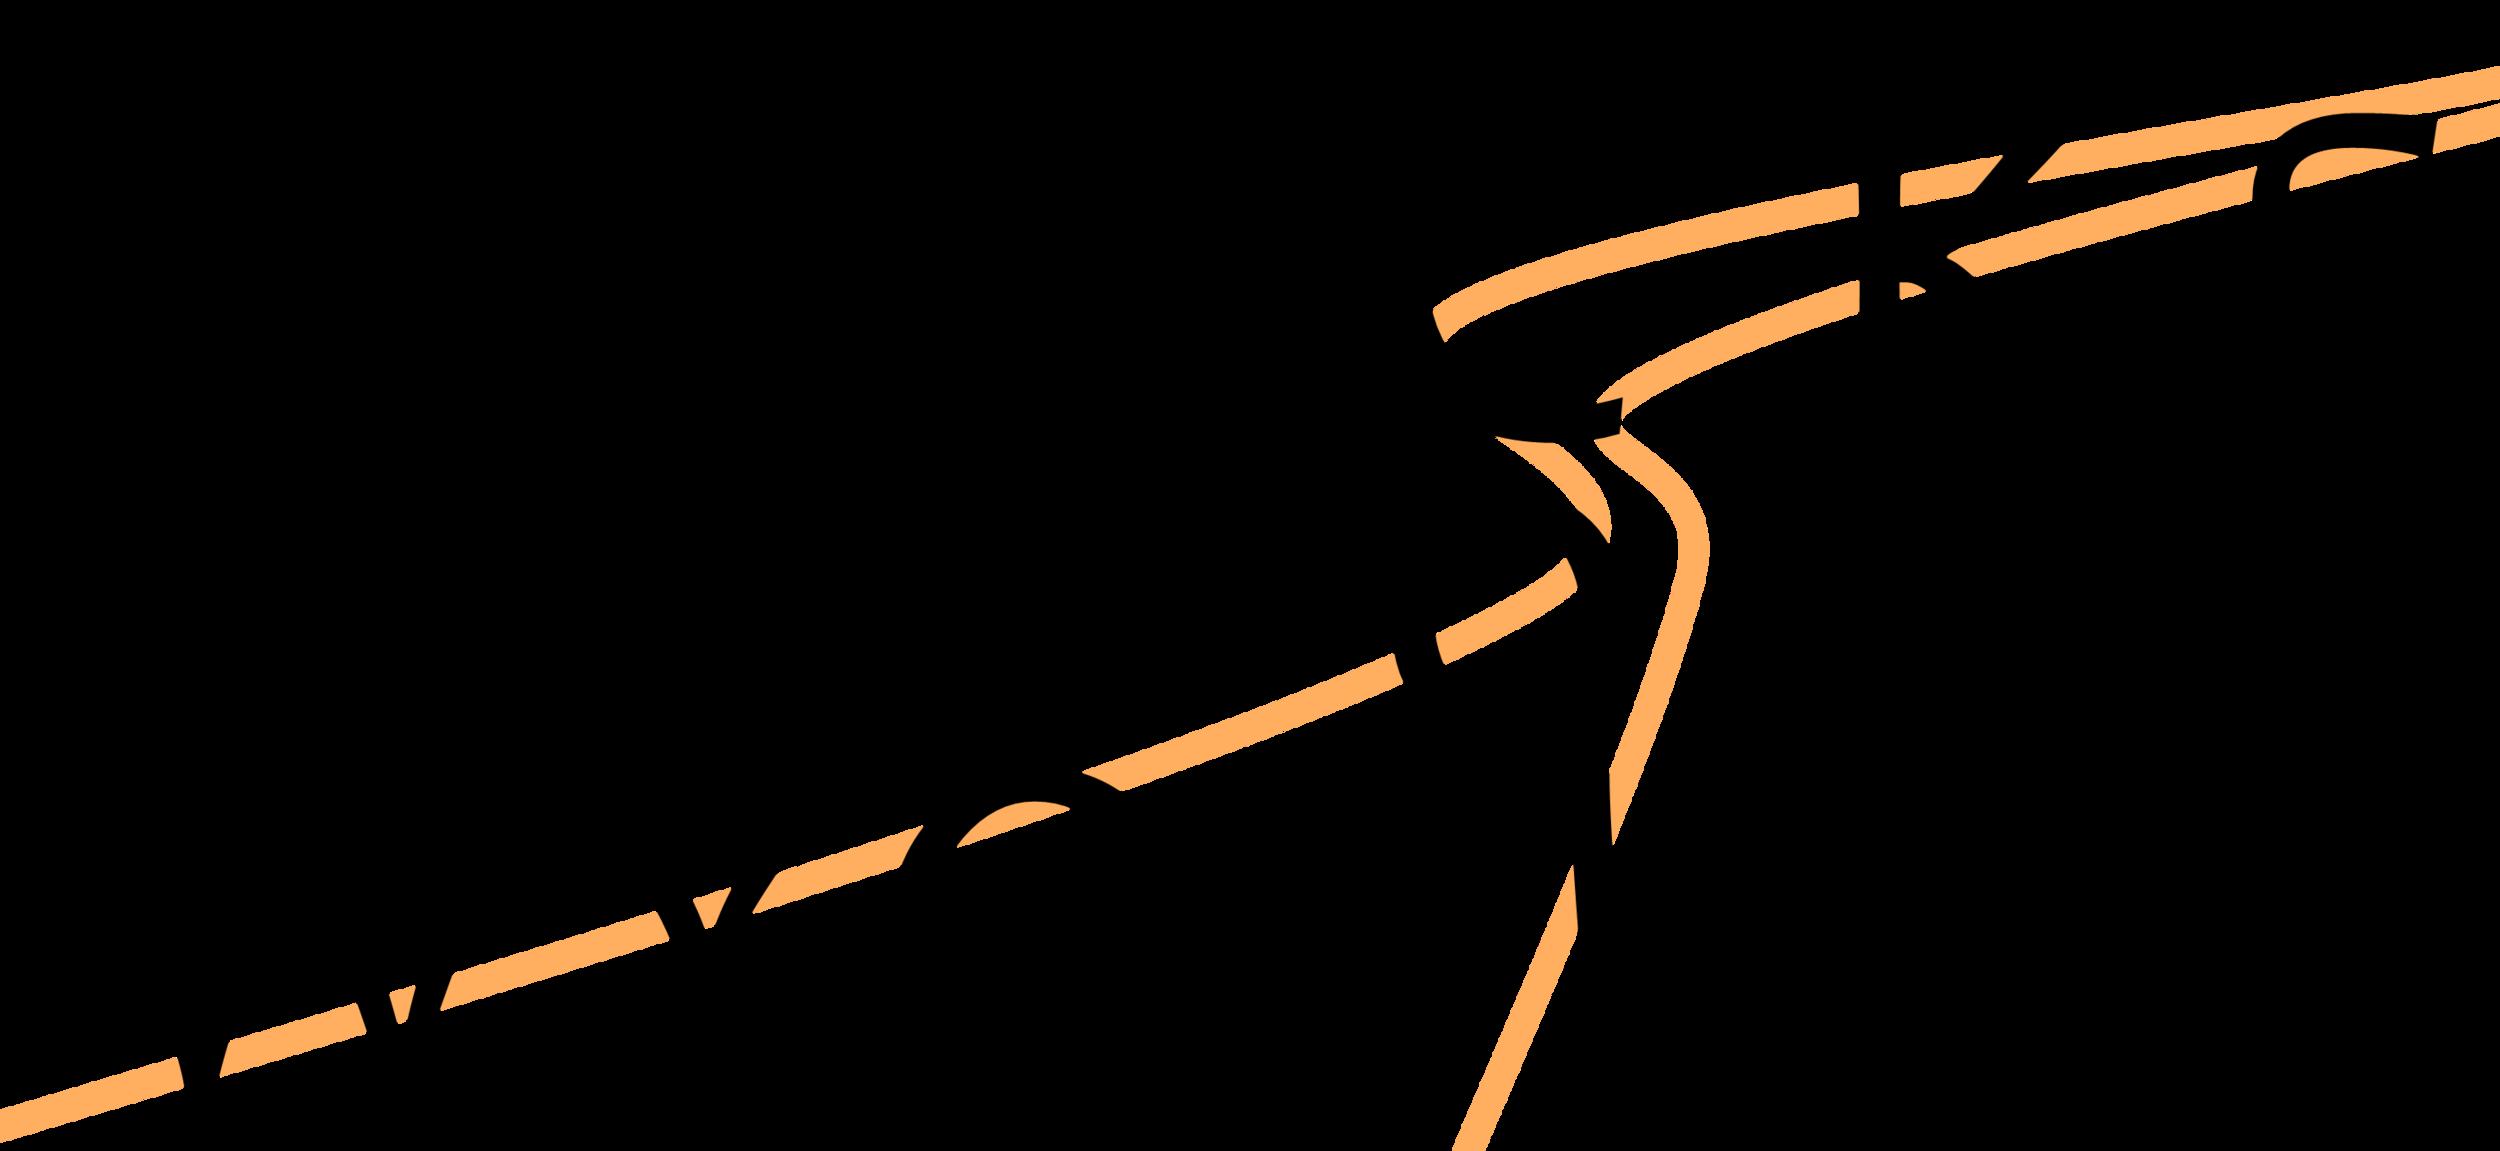 tracks logo final 1.png